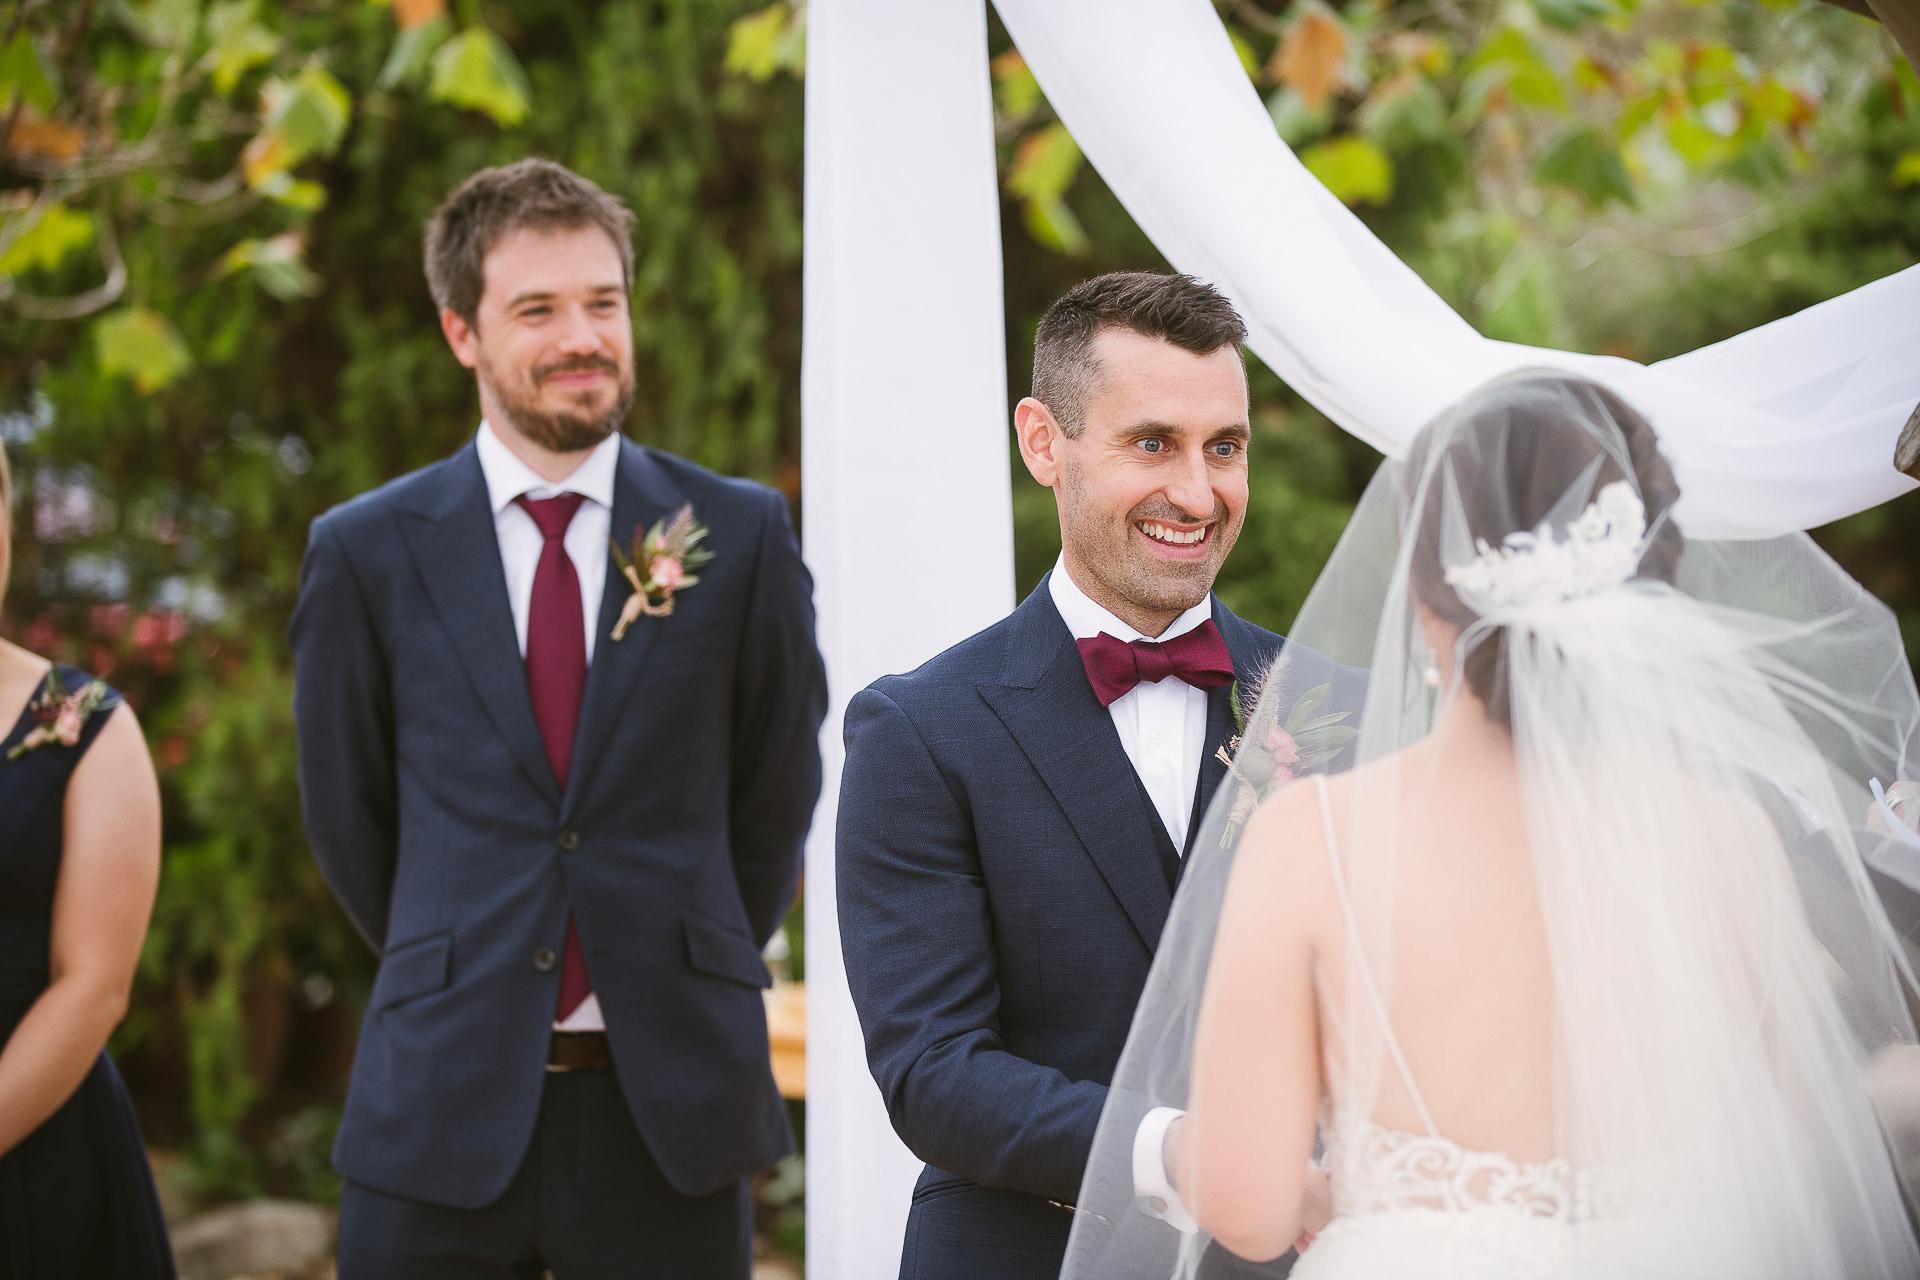 groom smiling over brides shoulder during ceremony at winery wedding